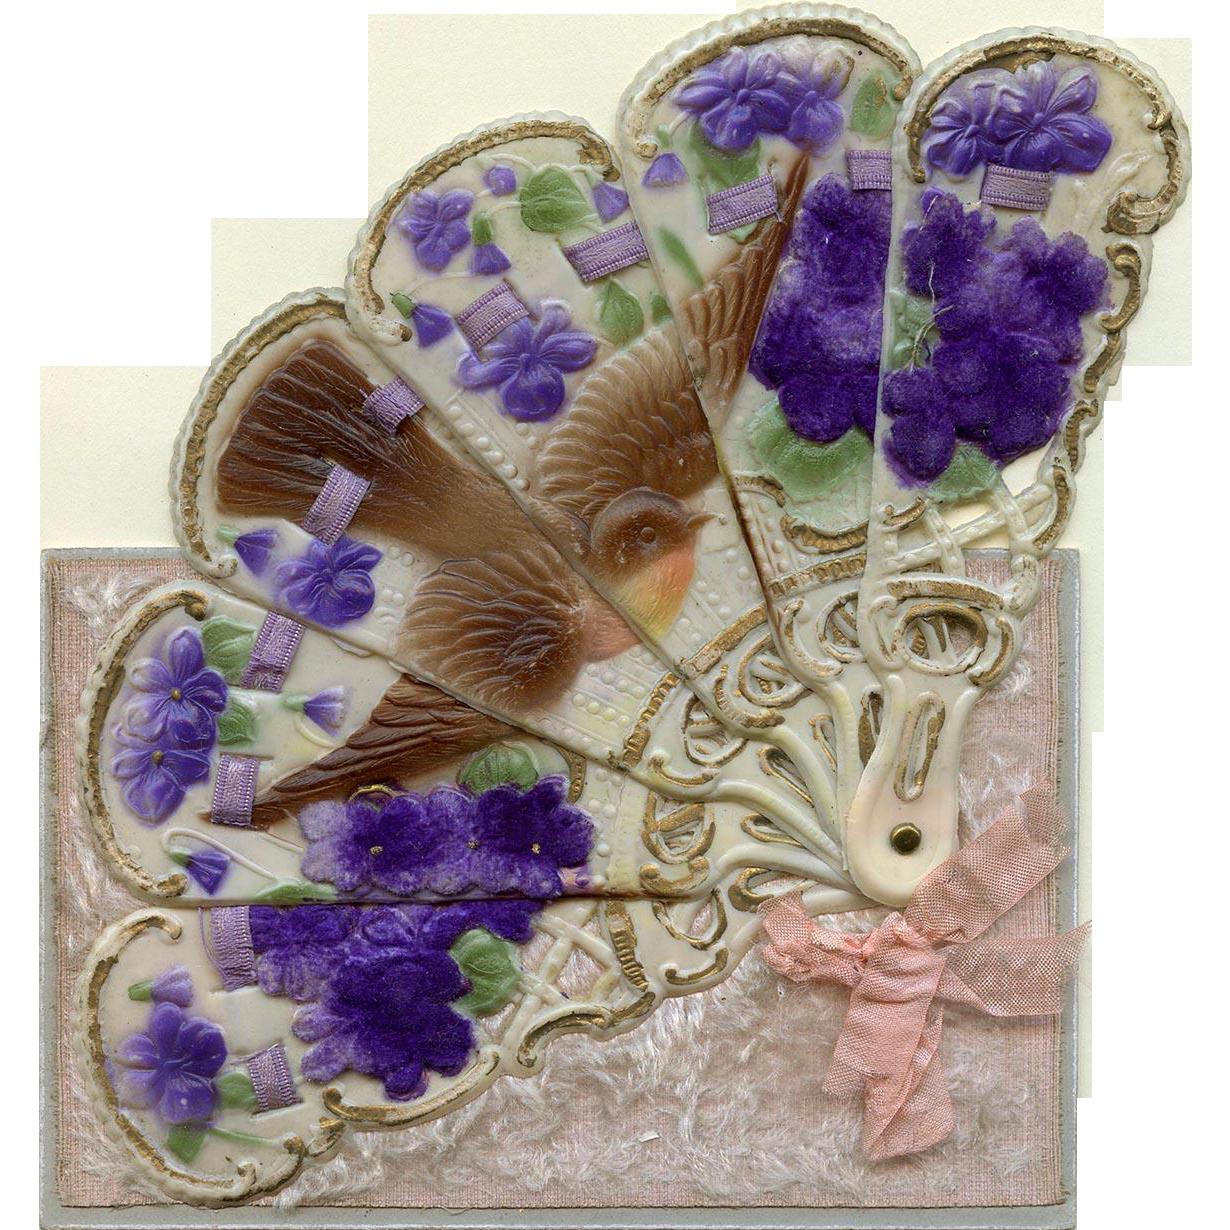 Antique Novelty Mechanical Postcard Unfolds into Fan of a Bird Amid Violets